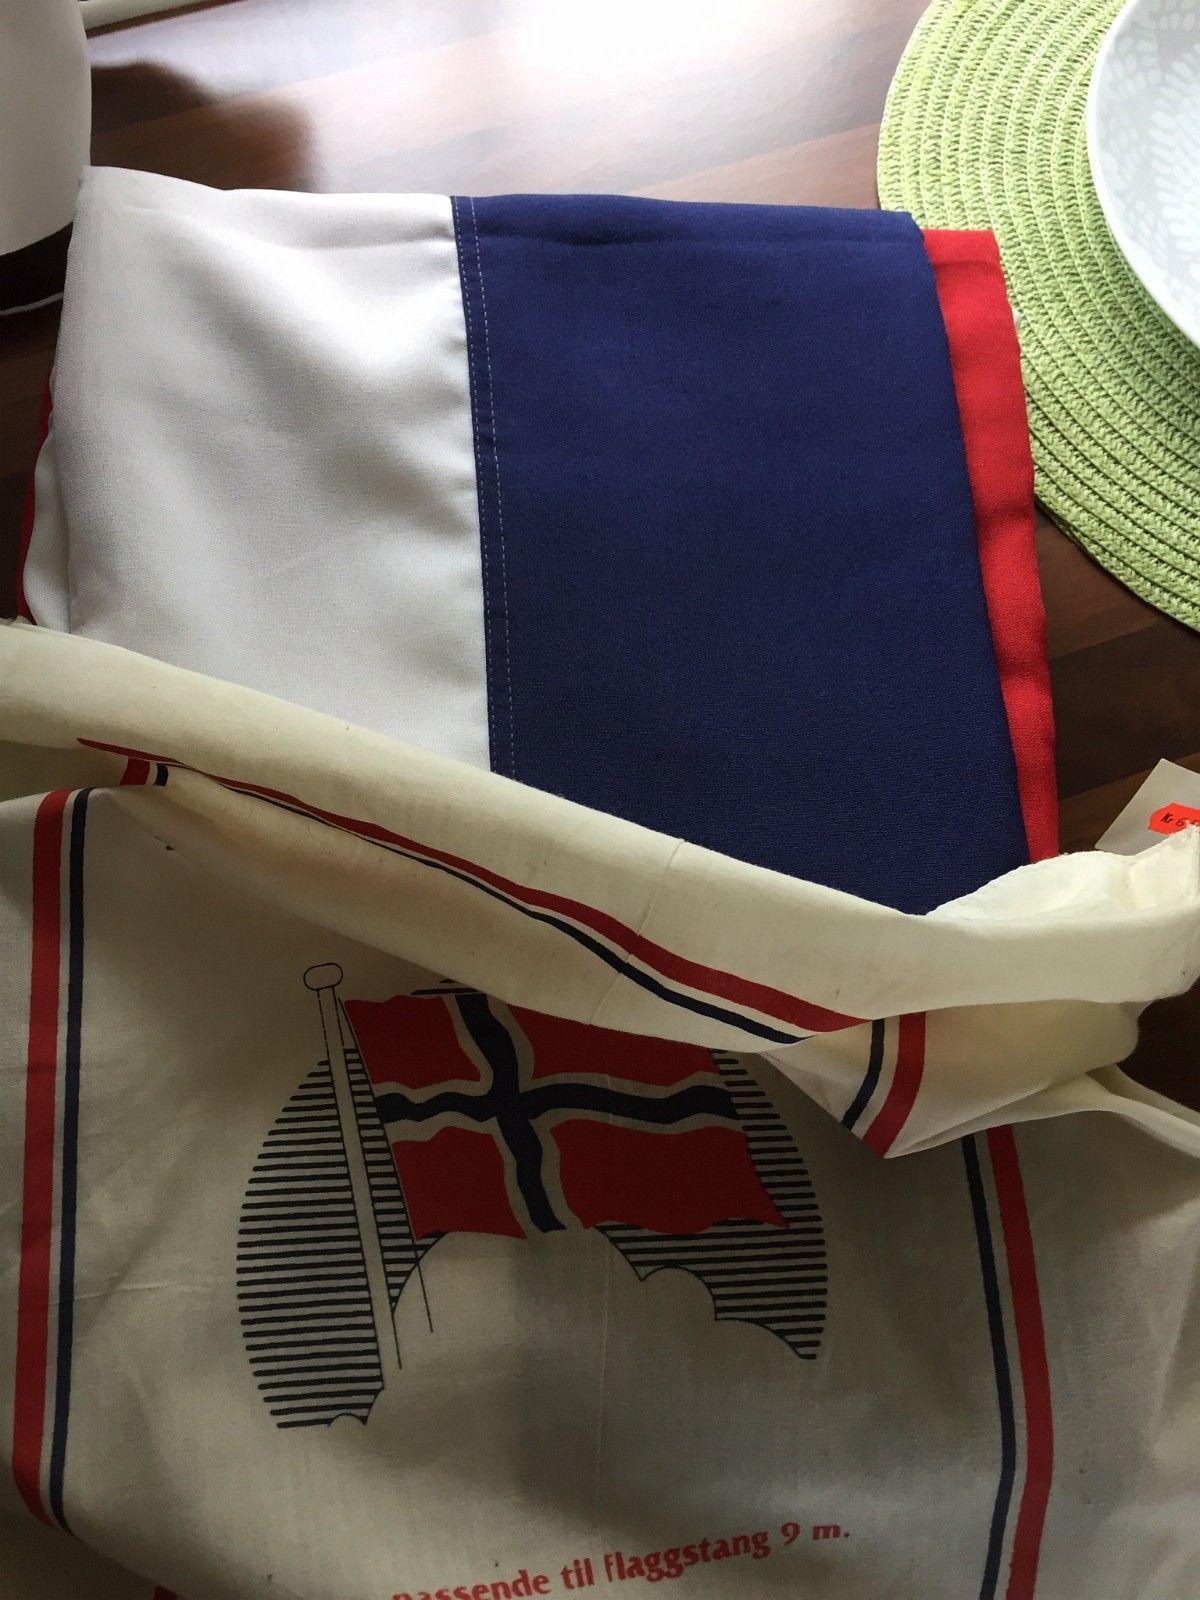 Nytt norskt flagg - Kråkerøy  - Nytt flagg 3m, til 9 meters stang - Kråkerøy